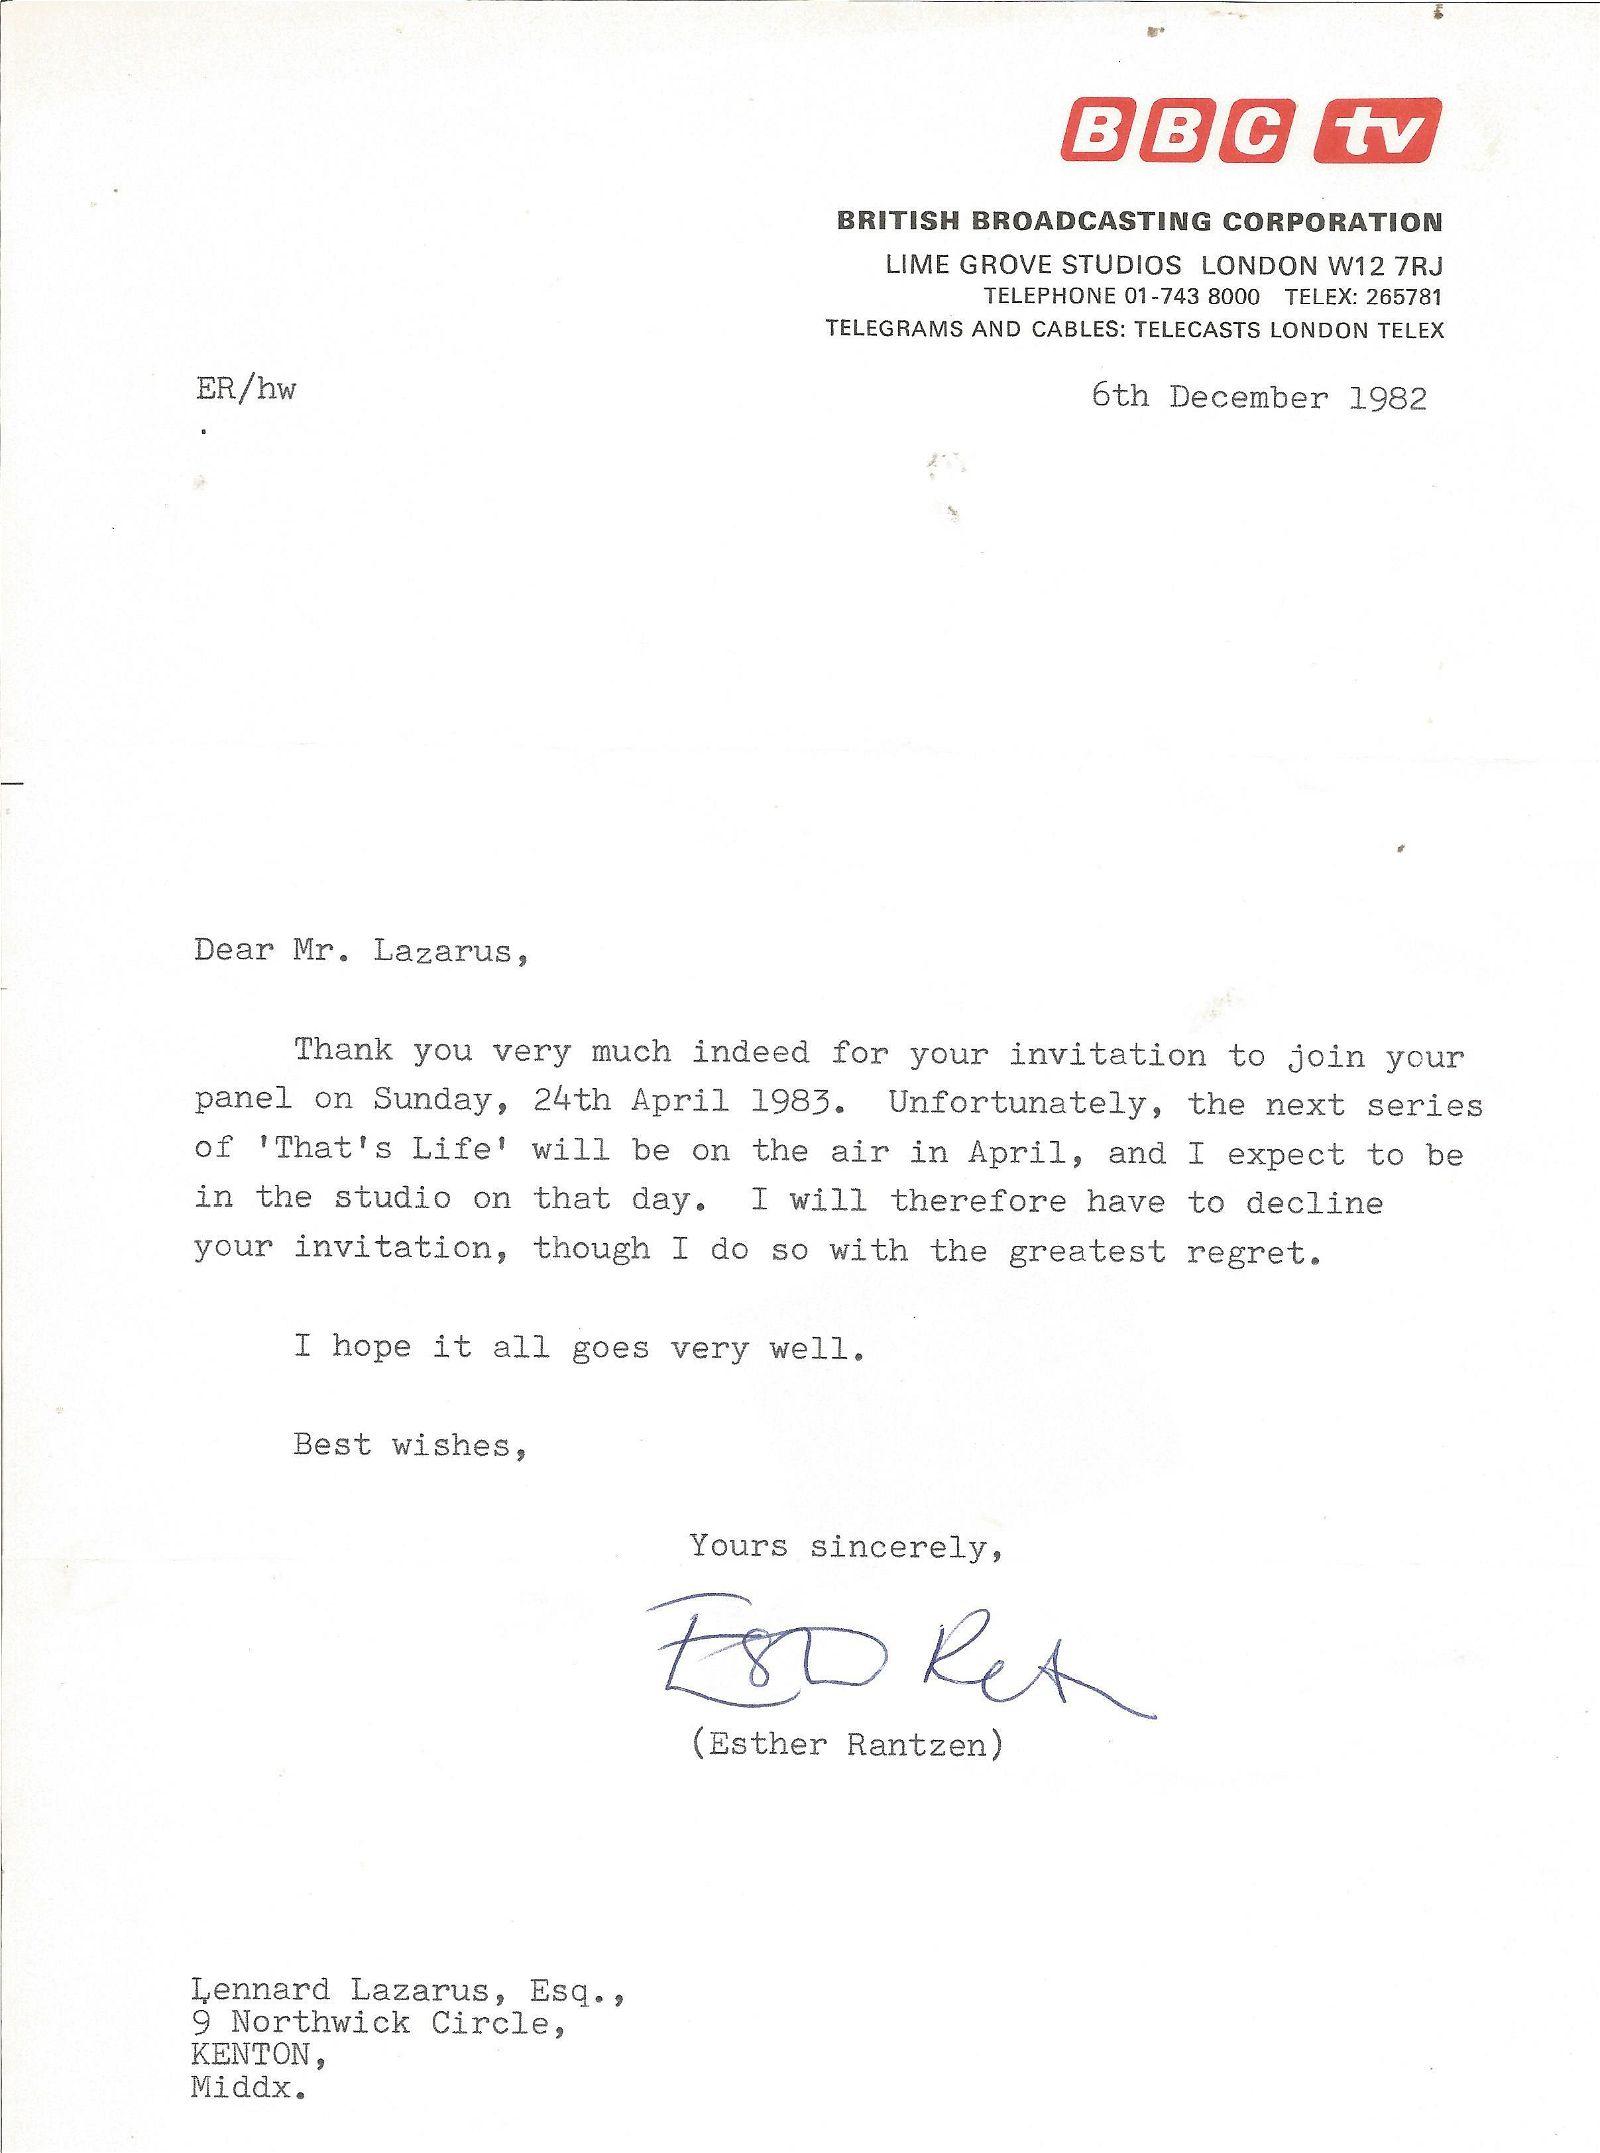 Esther Rantzen TLS dated 6/12/82. Good Condition. All